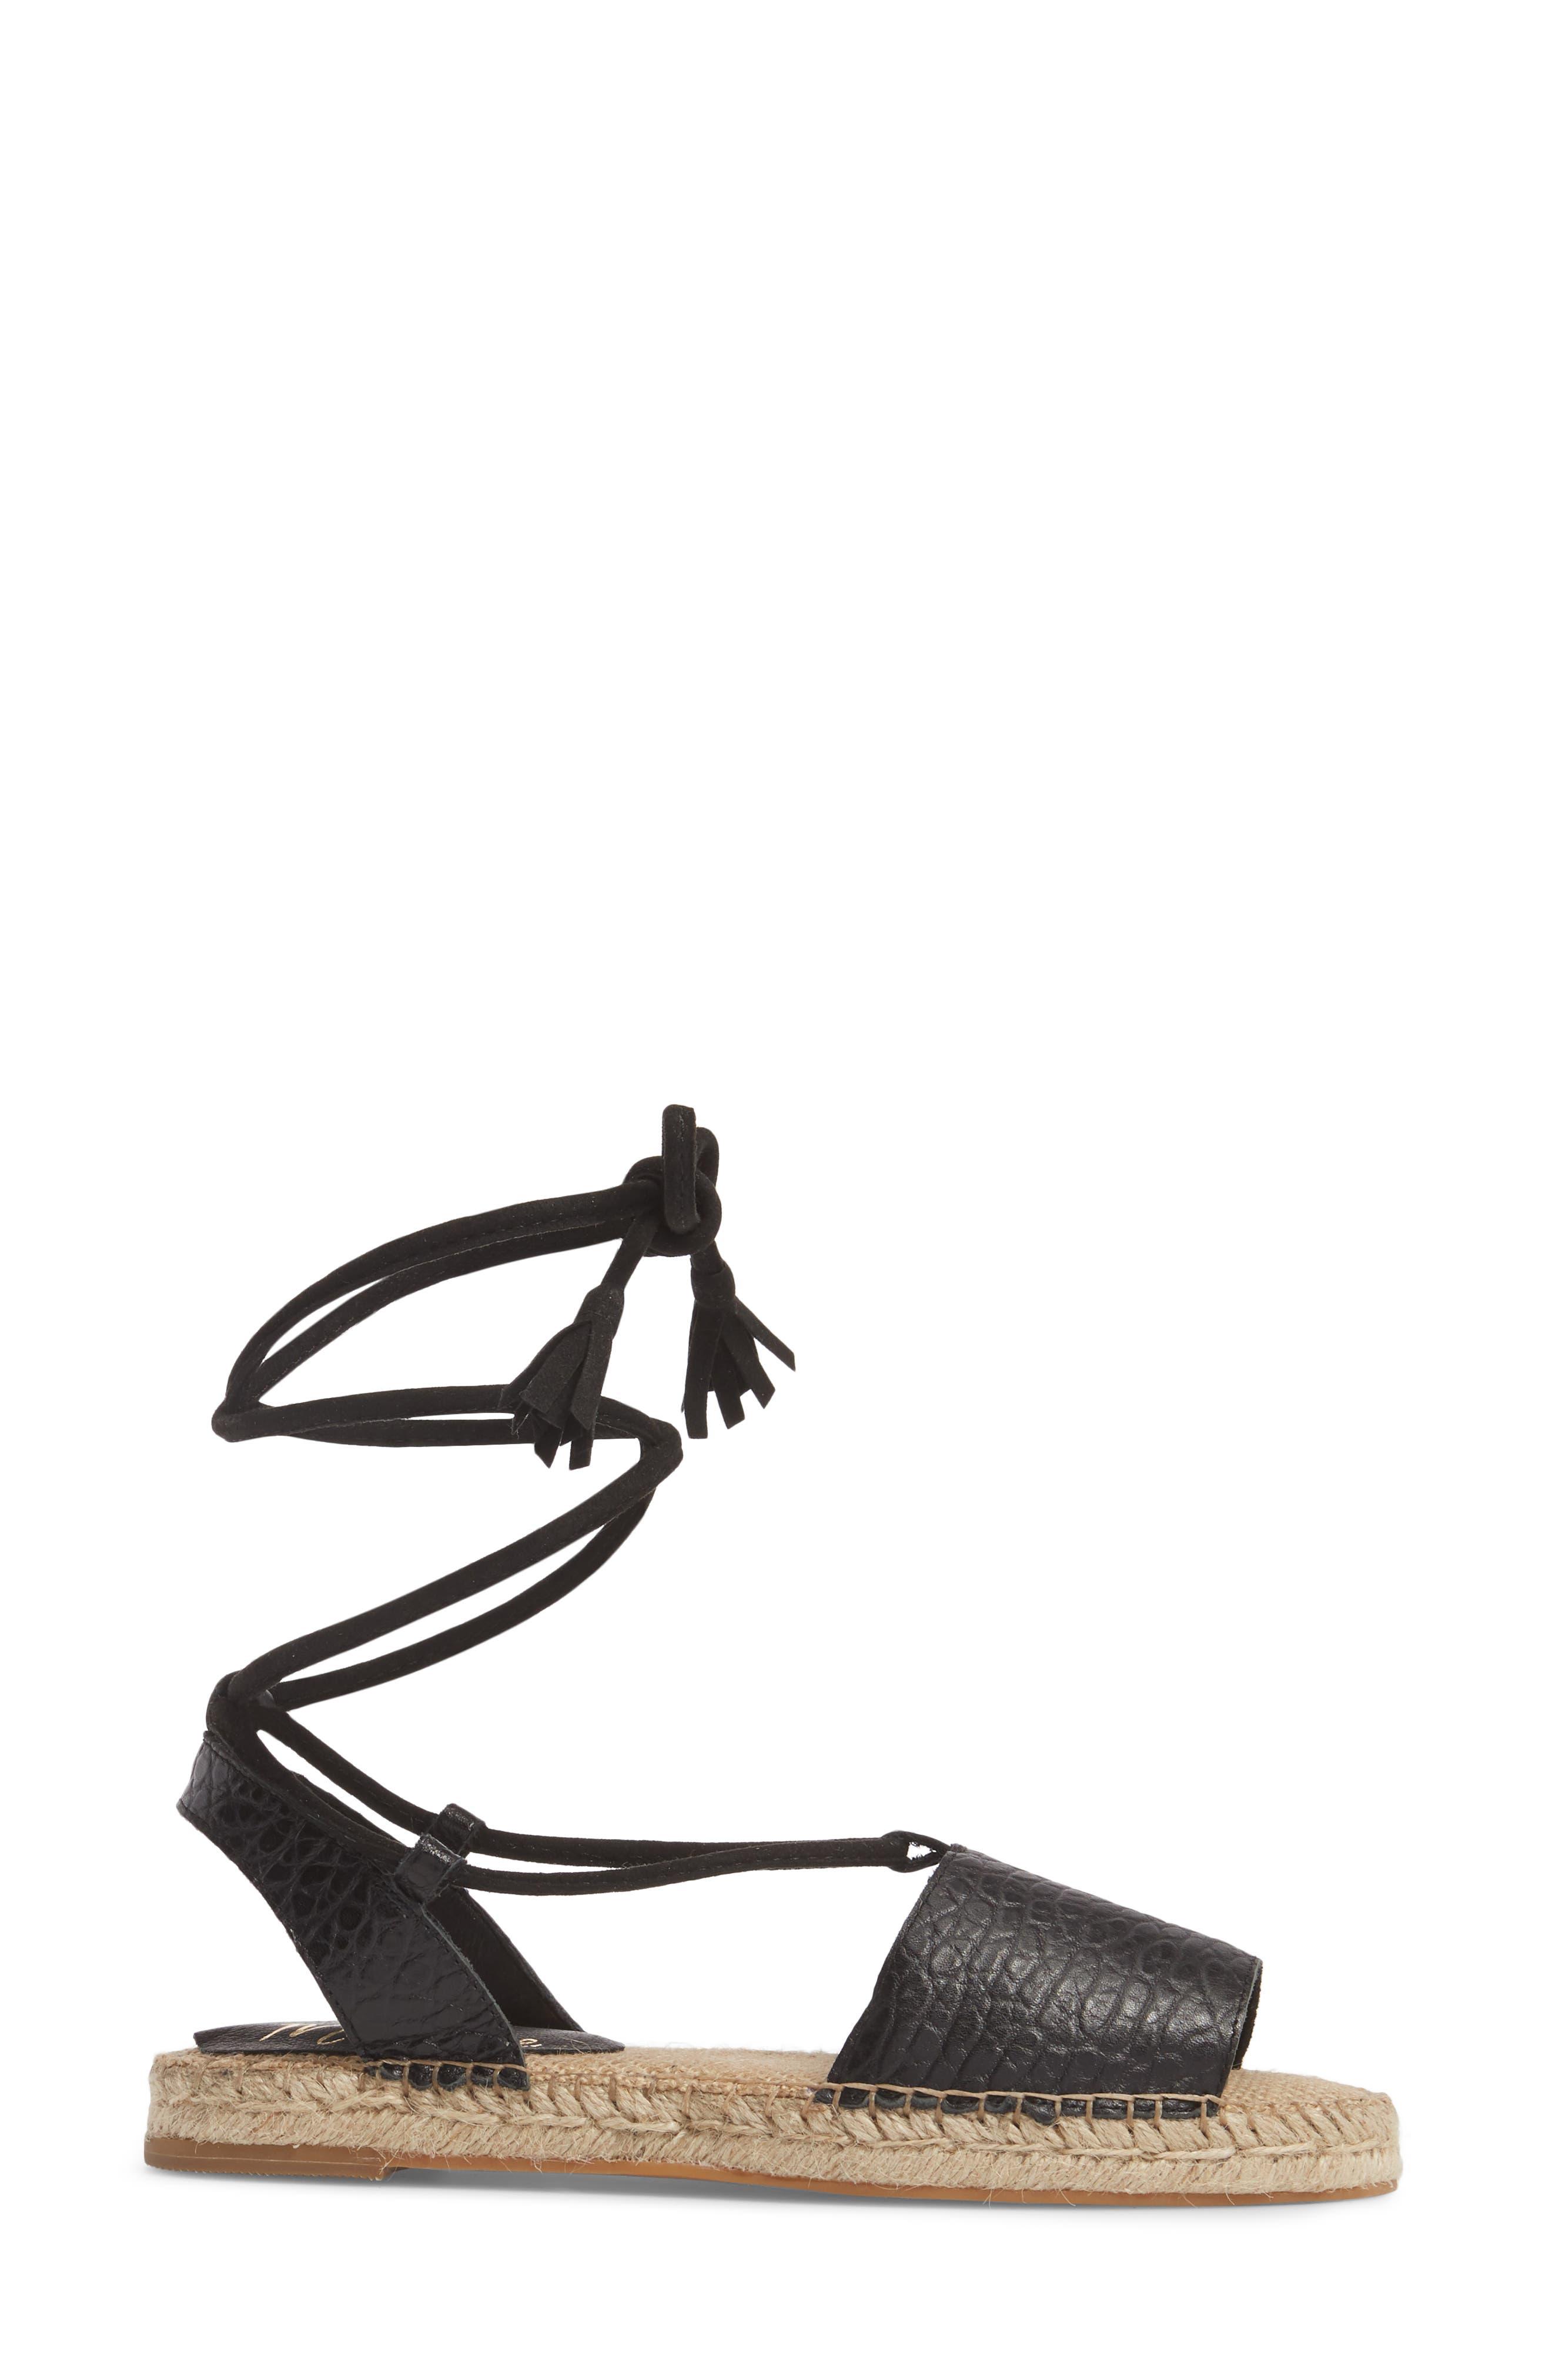 Amuse Society x Matisse La Vita Sandal,                             Alternate thumbnail 3, color,                             BLACK LEATHER